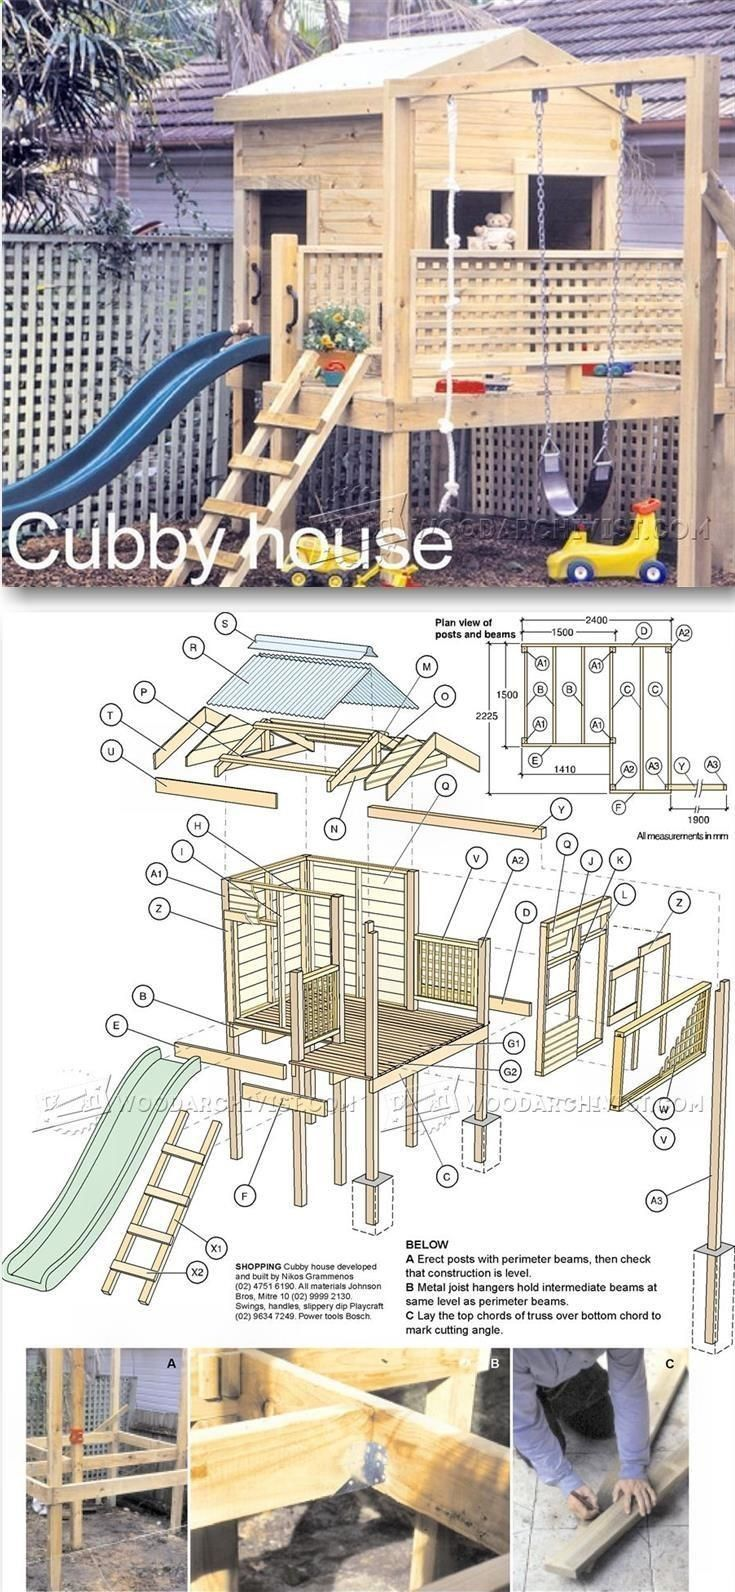 Backyard Playhouse Plans Children S Outdoor Plans And Projects Woodarchivist Com Outdoorplayhouseplans Back Rumah Bermain Rumah Pohon Rencana Pertukangan